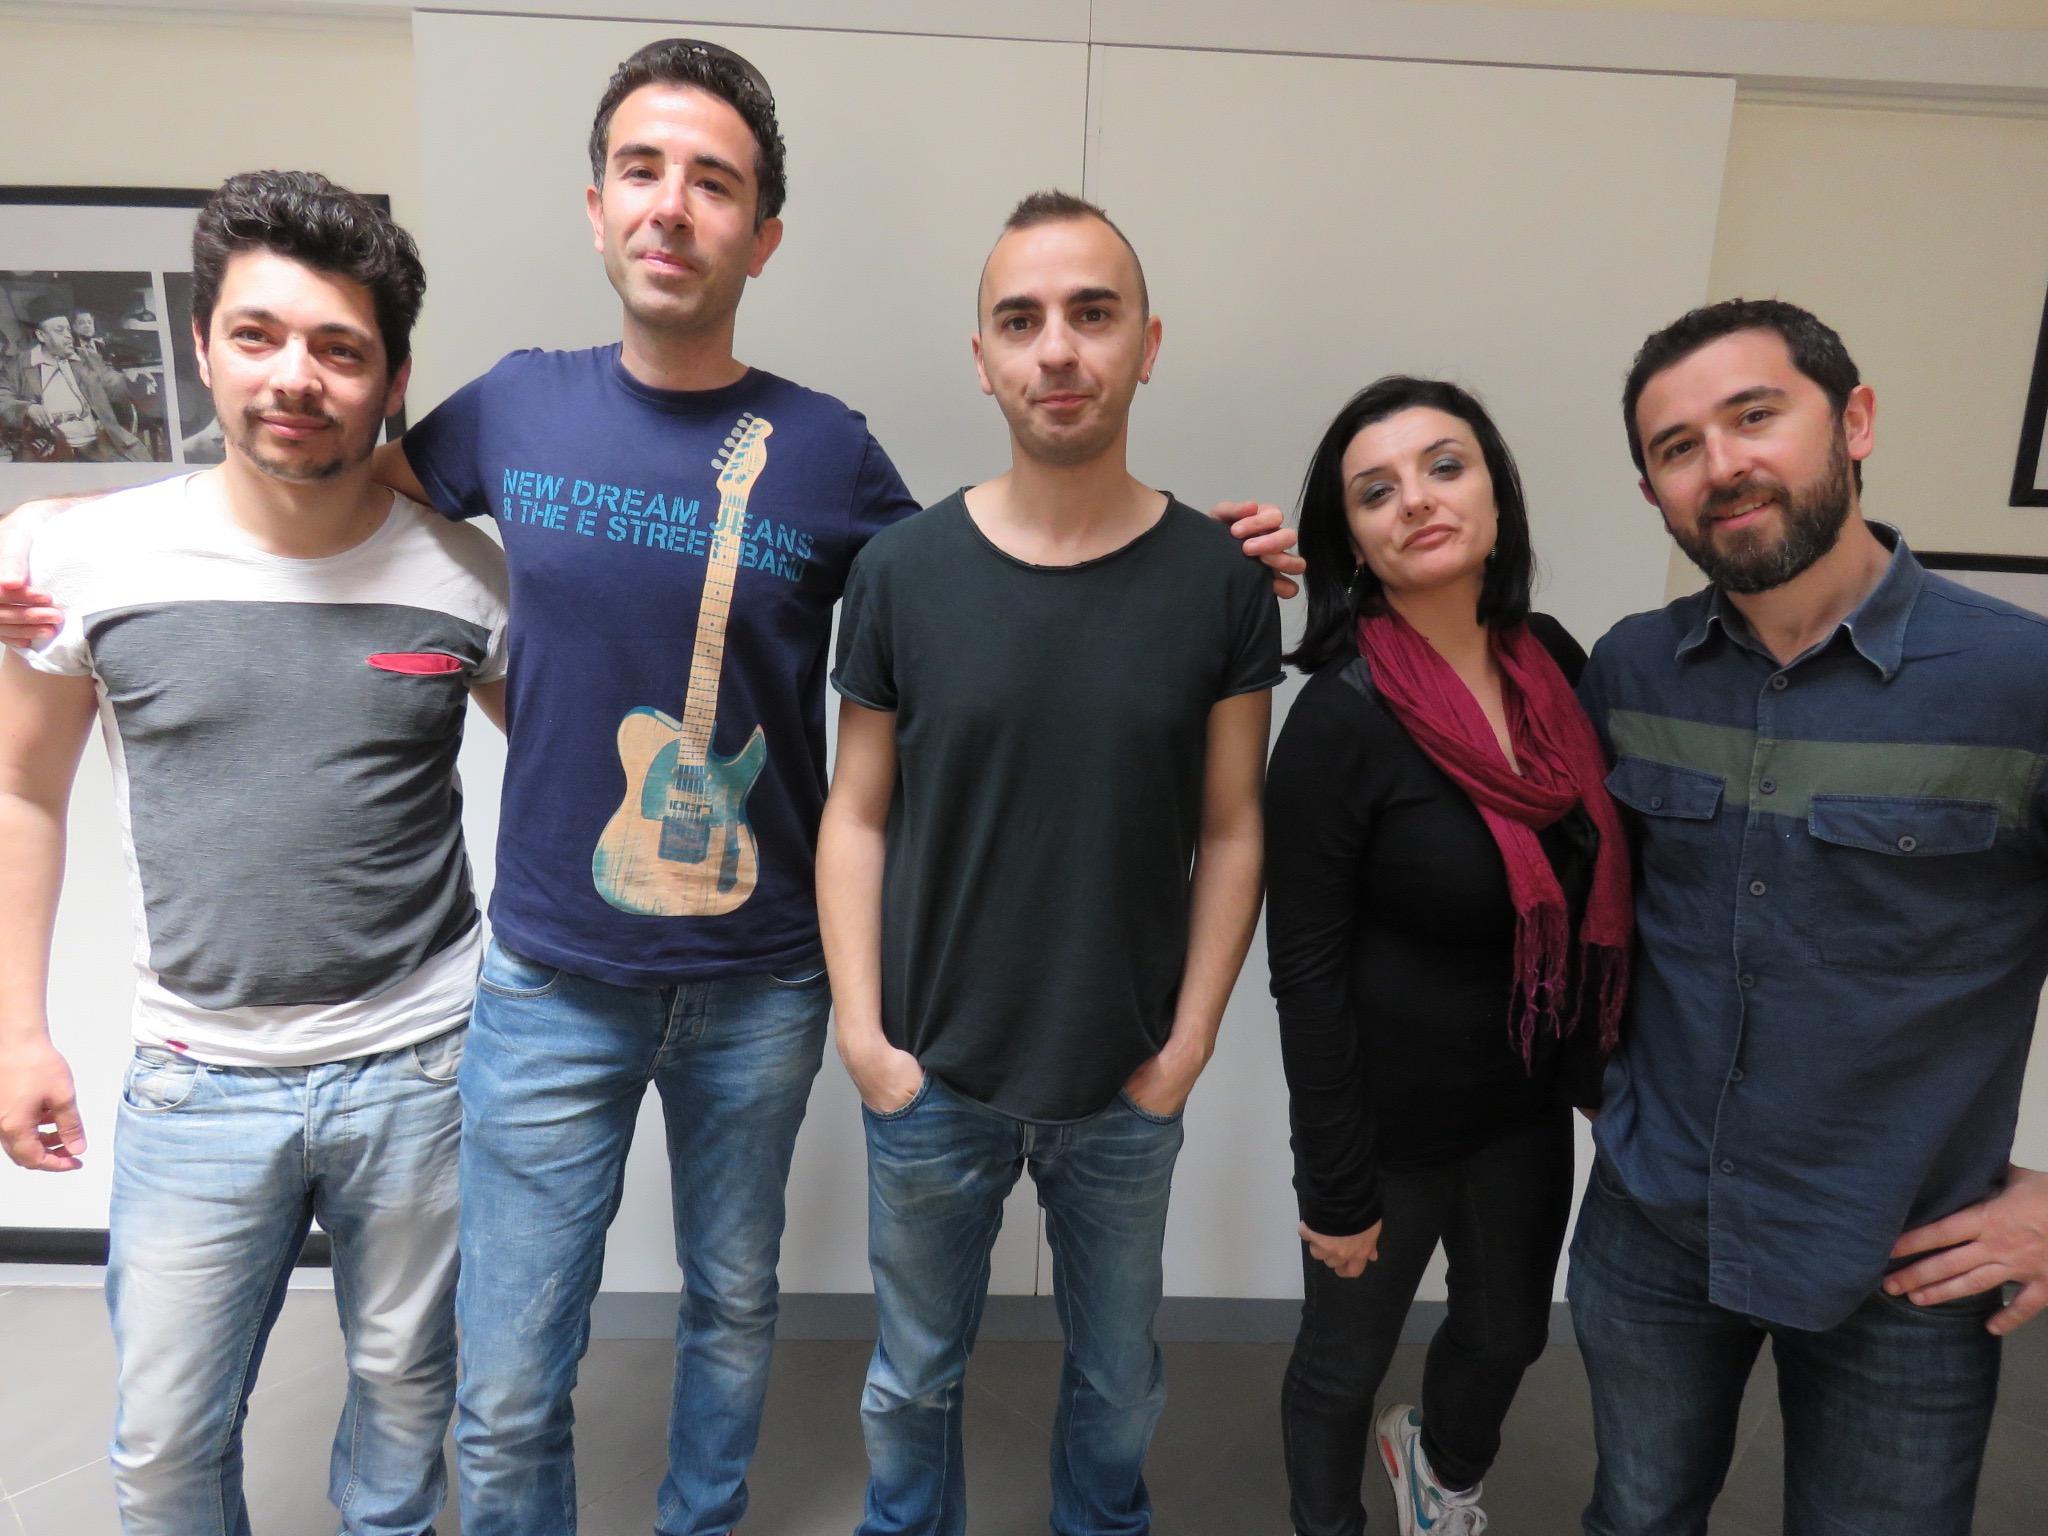 Cantabile, the new project by Fabio Nunziata